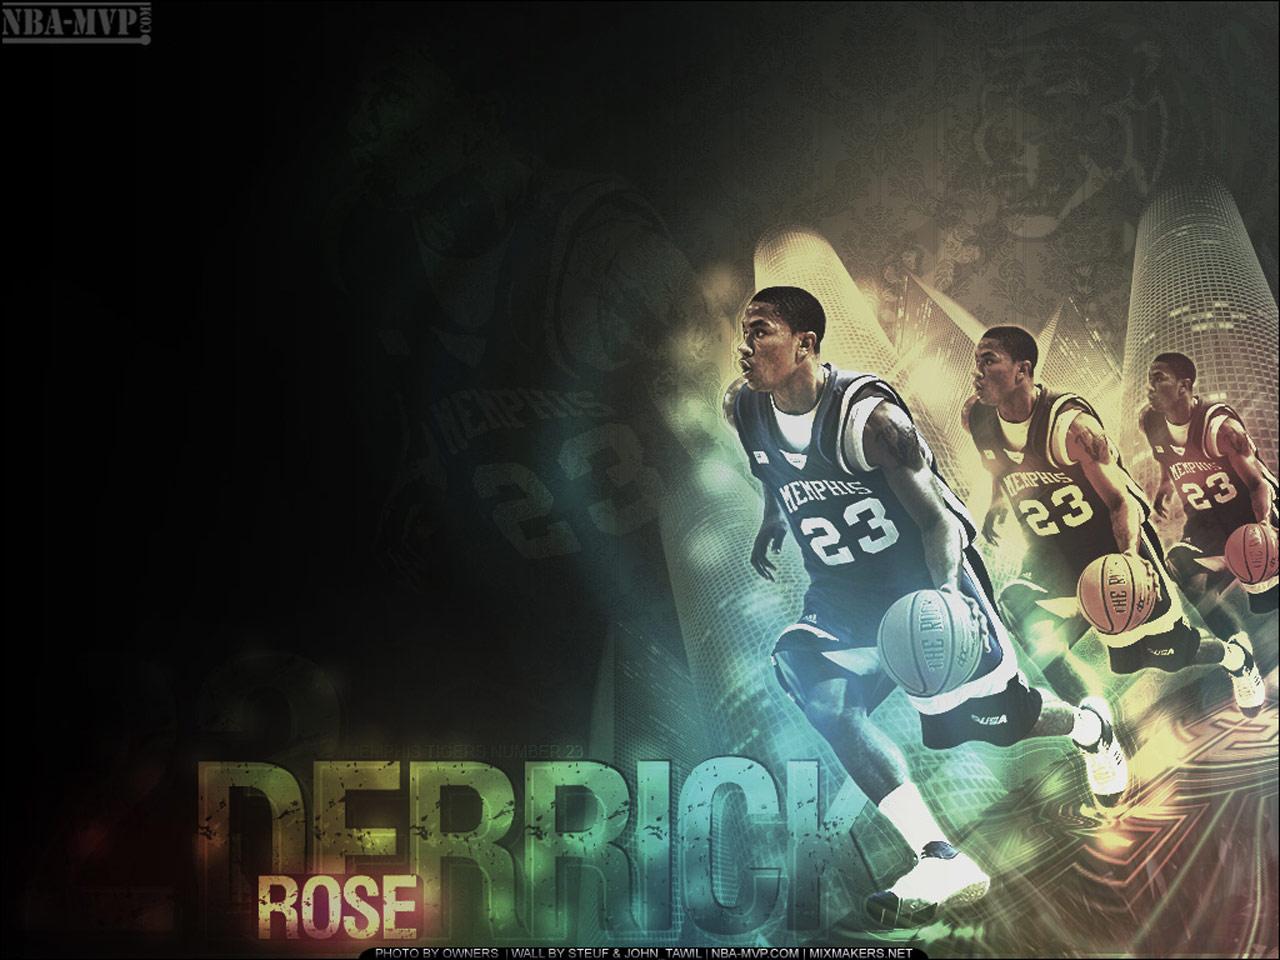 Derrick Rose basketball wallpapers NBA Wallpapers 1280x960